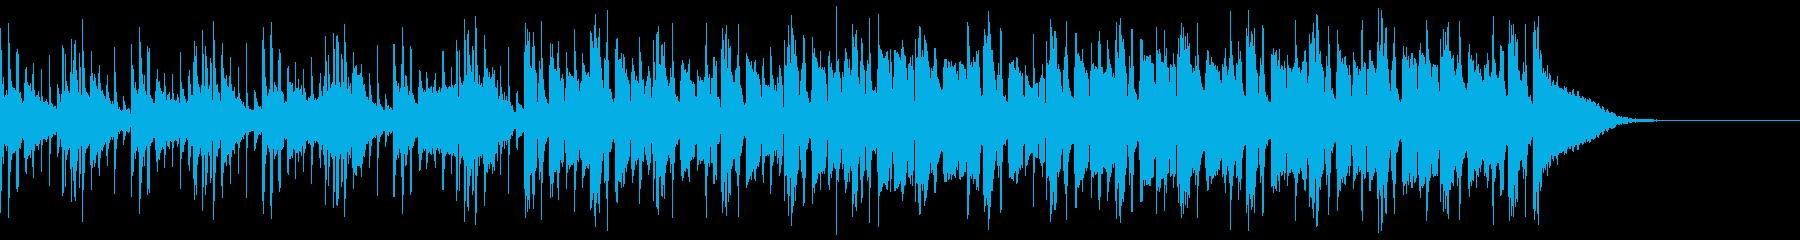 Pf「軽率」和風現代ジャズの再生済みの波形